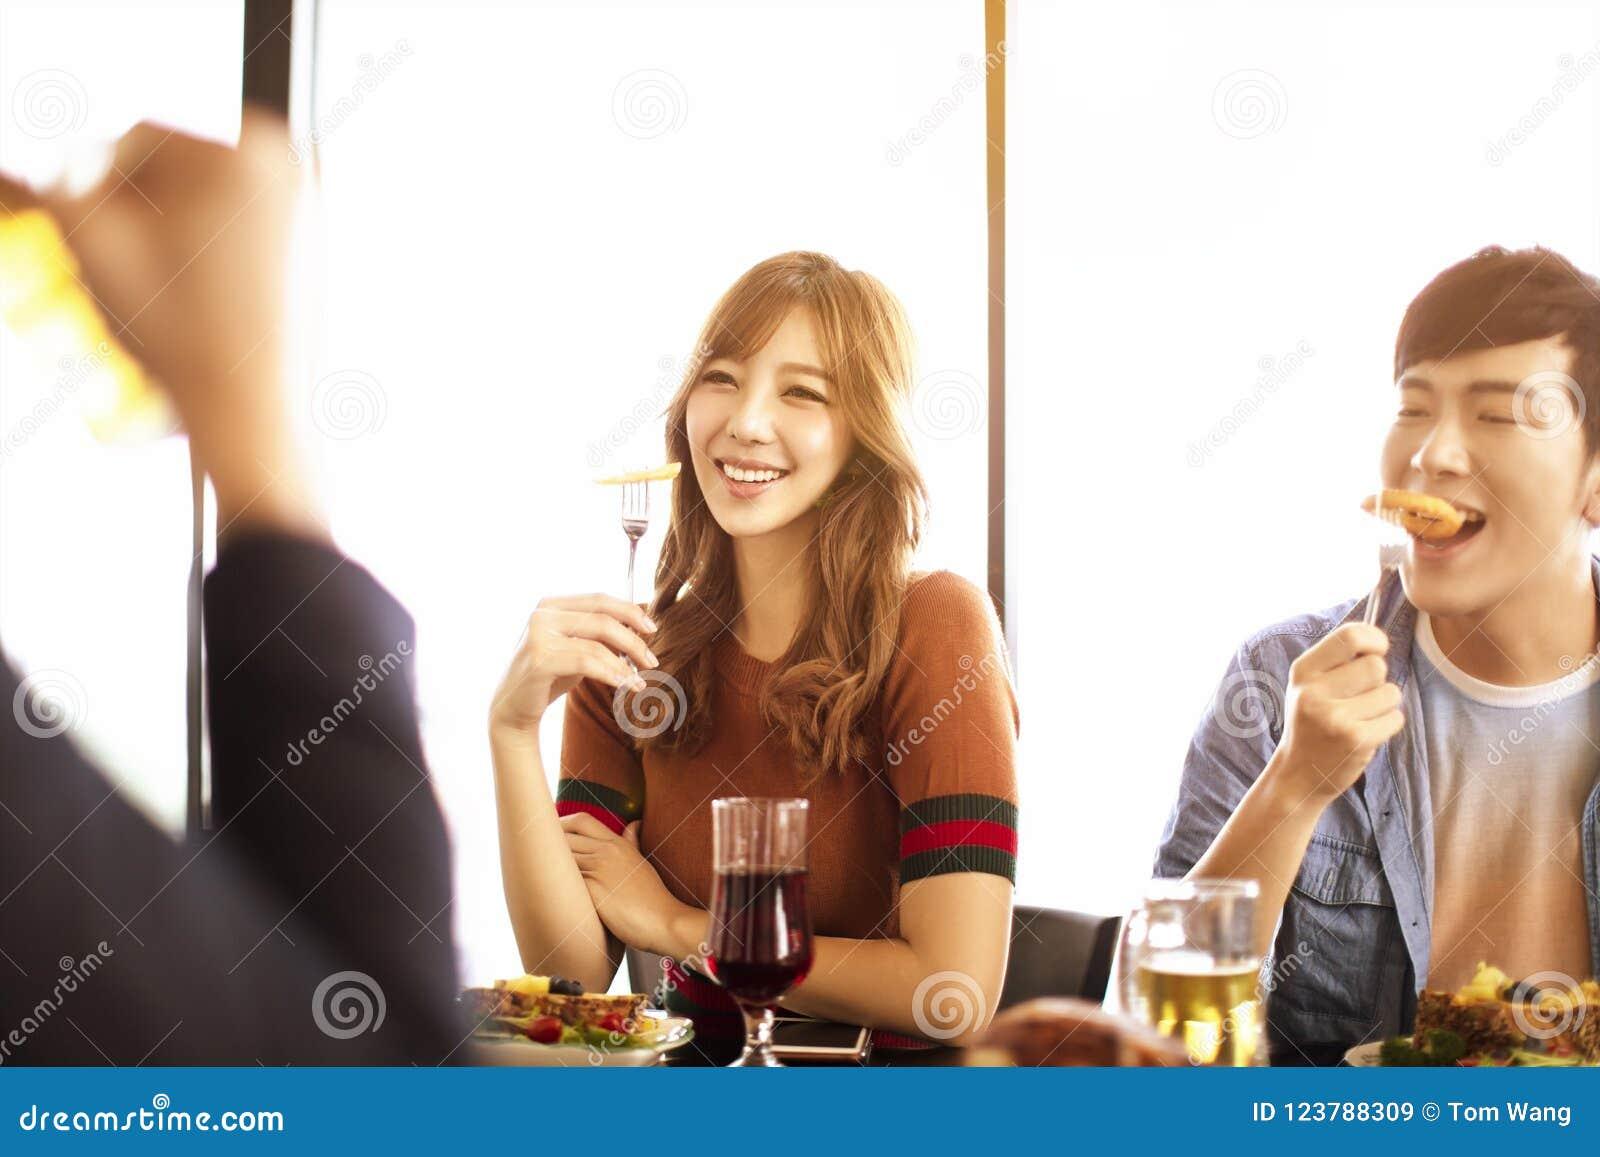 young friends enjoy dinner in restaurant.